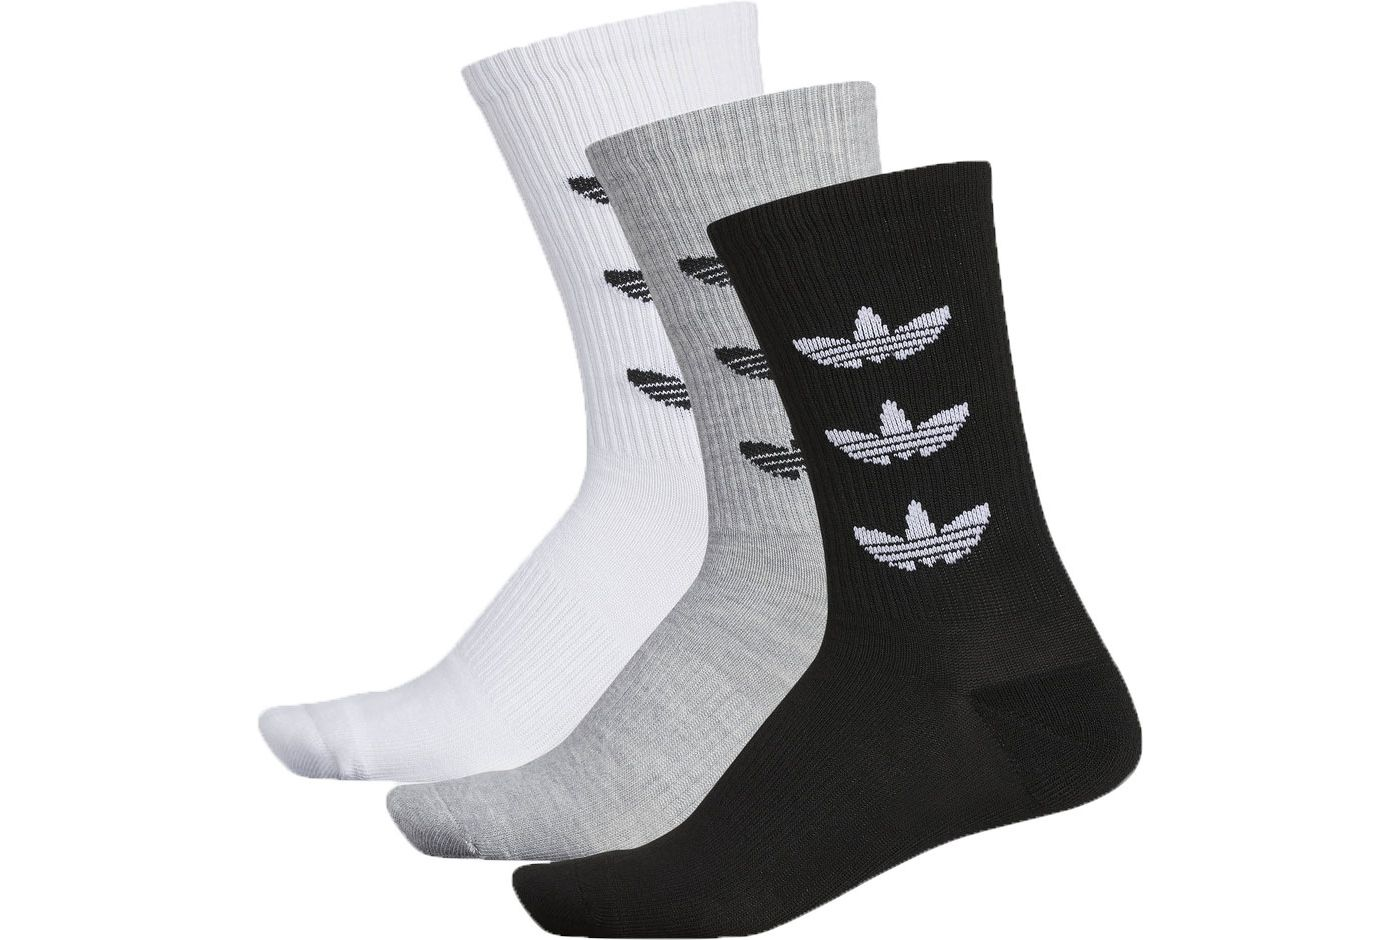 adidas Originals Men's Trefoil Repeat Crew Socks - 3 Pack